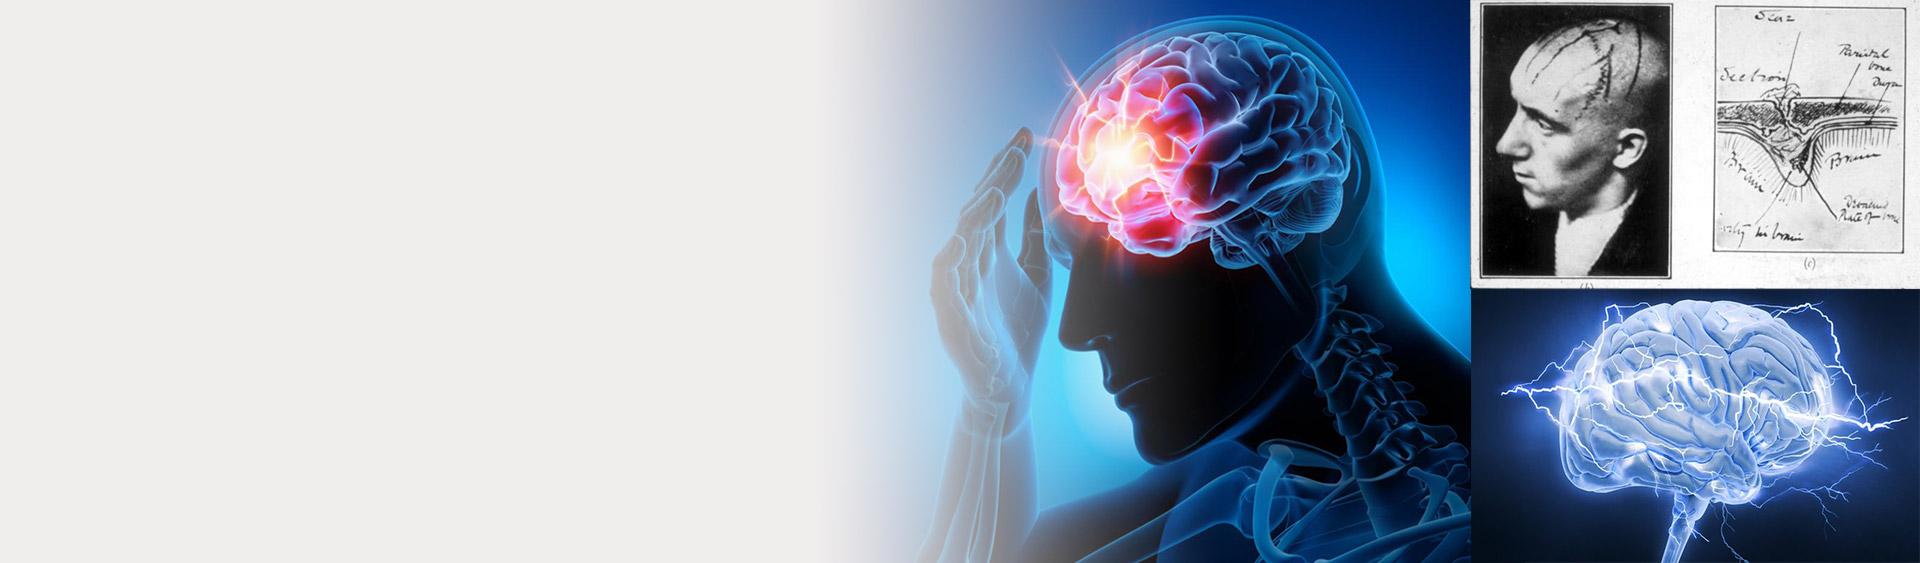 Epilepsy Problem in Human